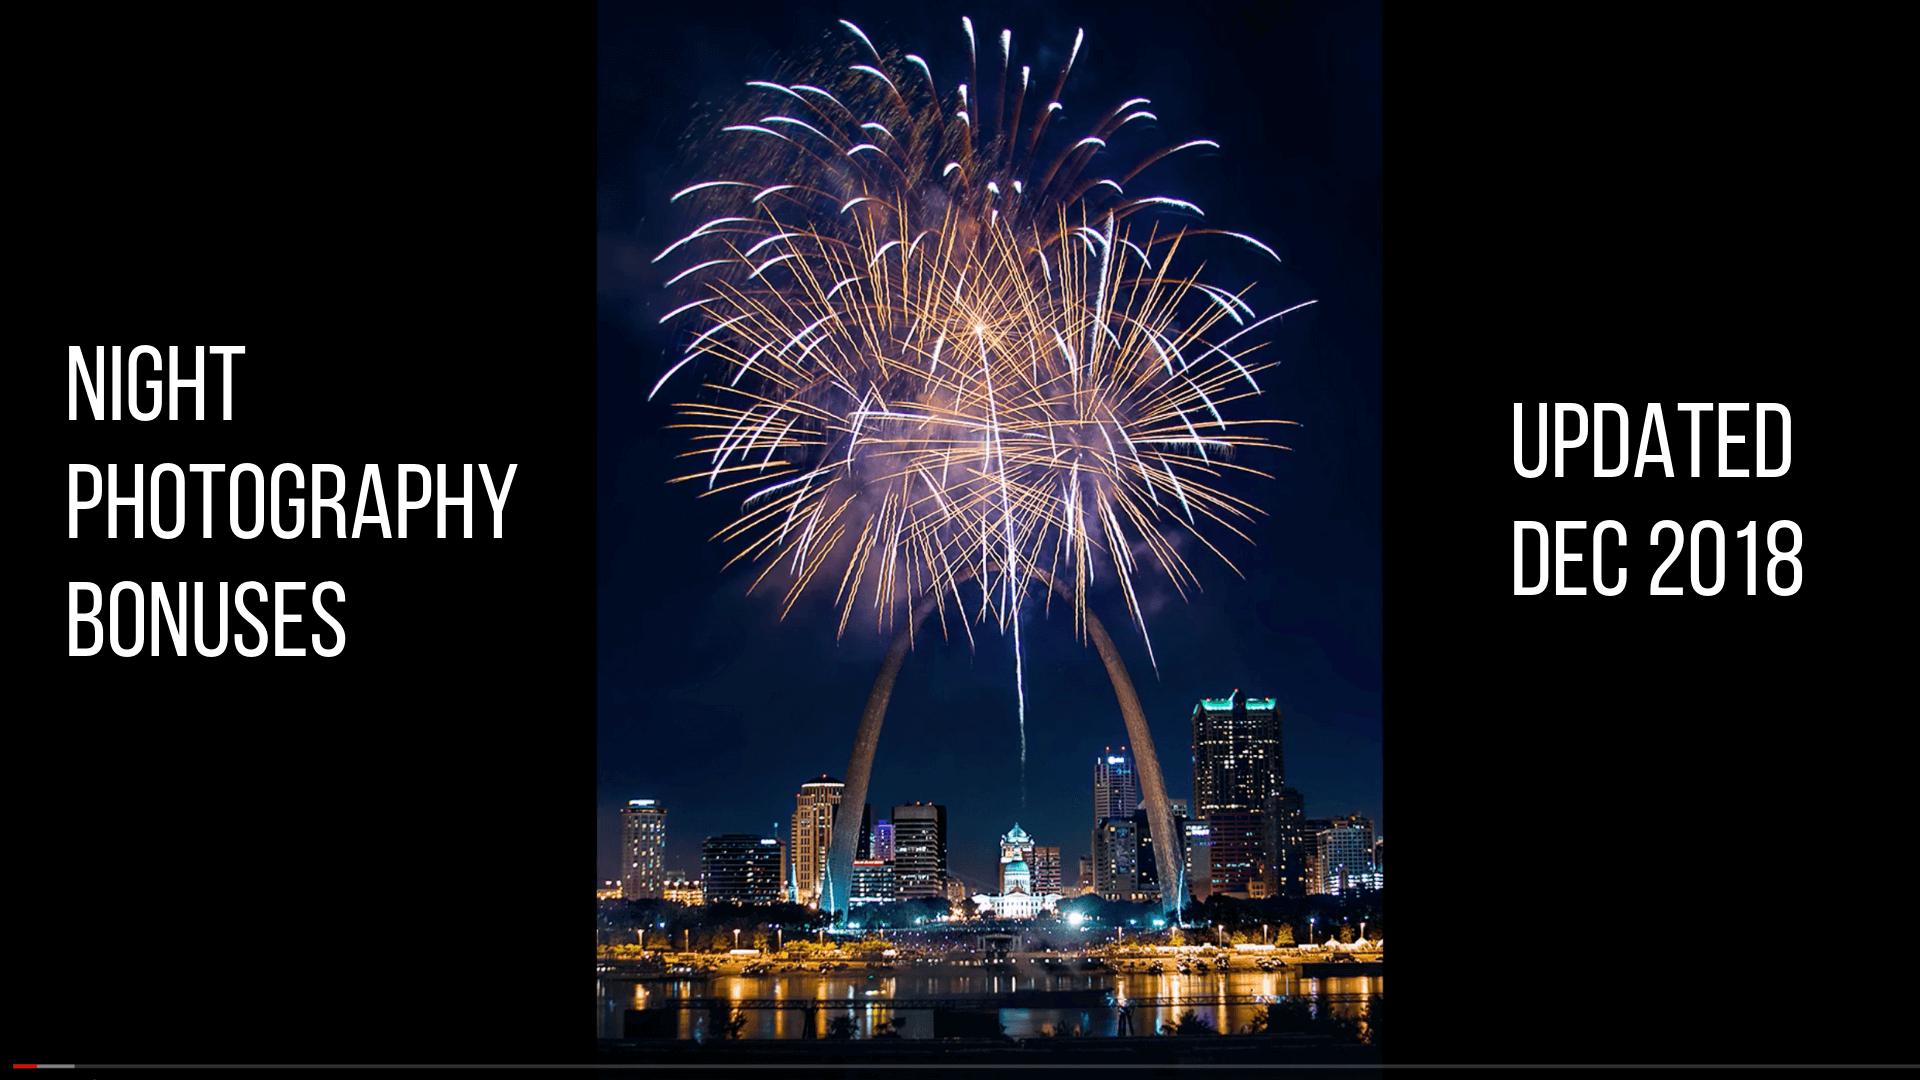 Night Photography Bonuses